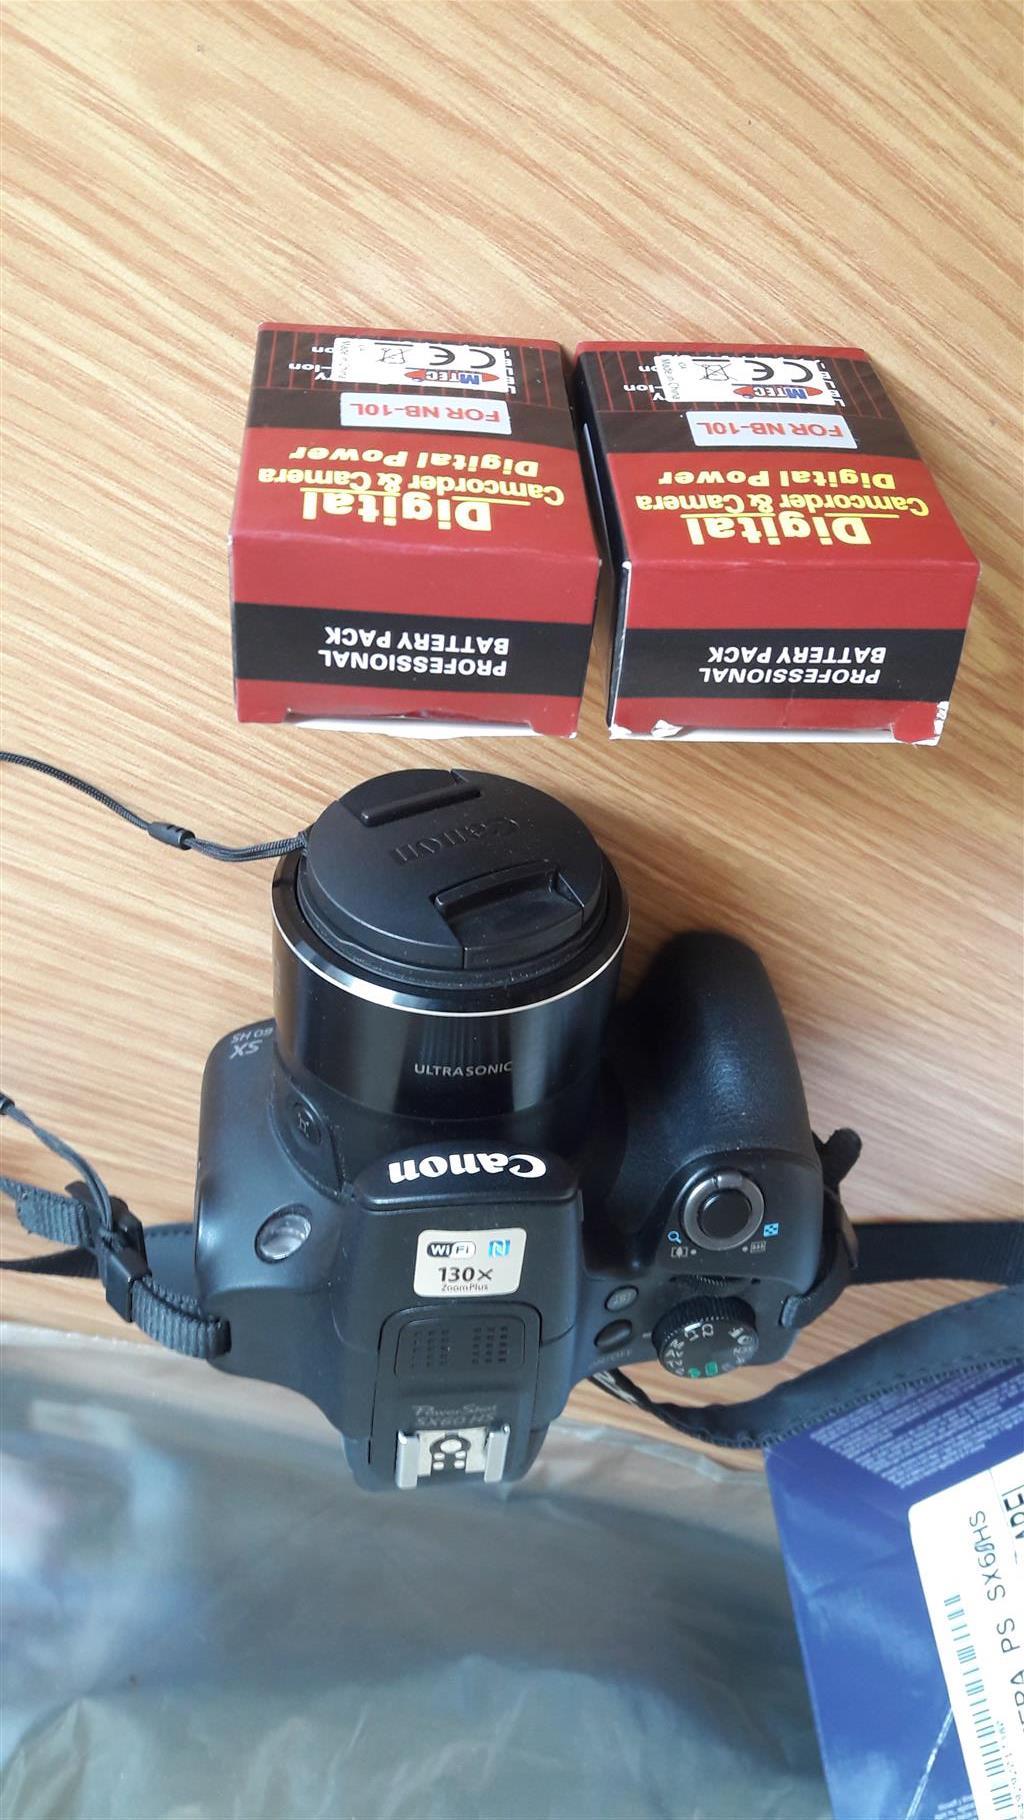 Canon SX 60 HS PowerShot camera